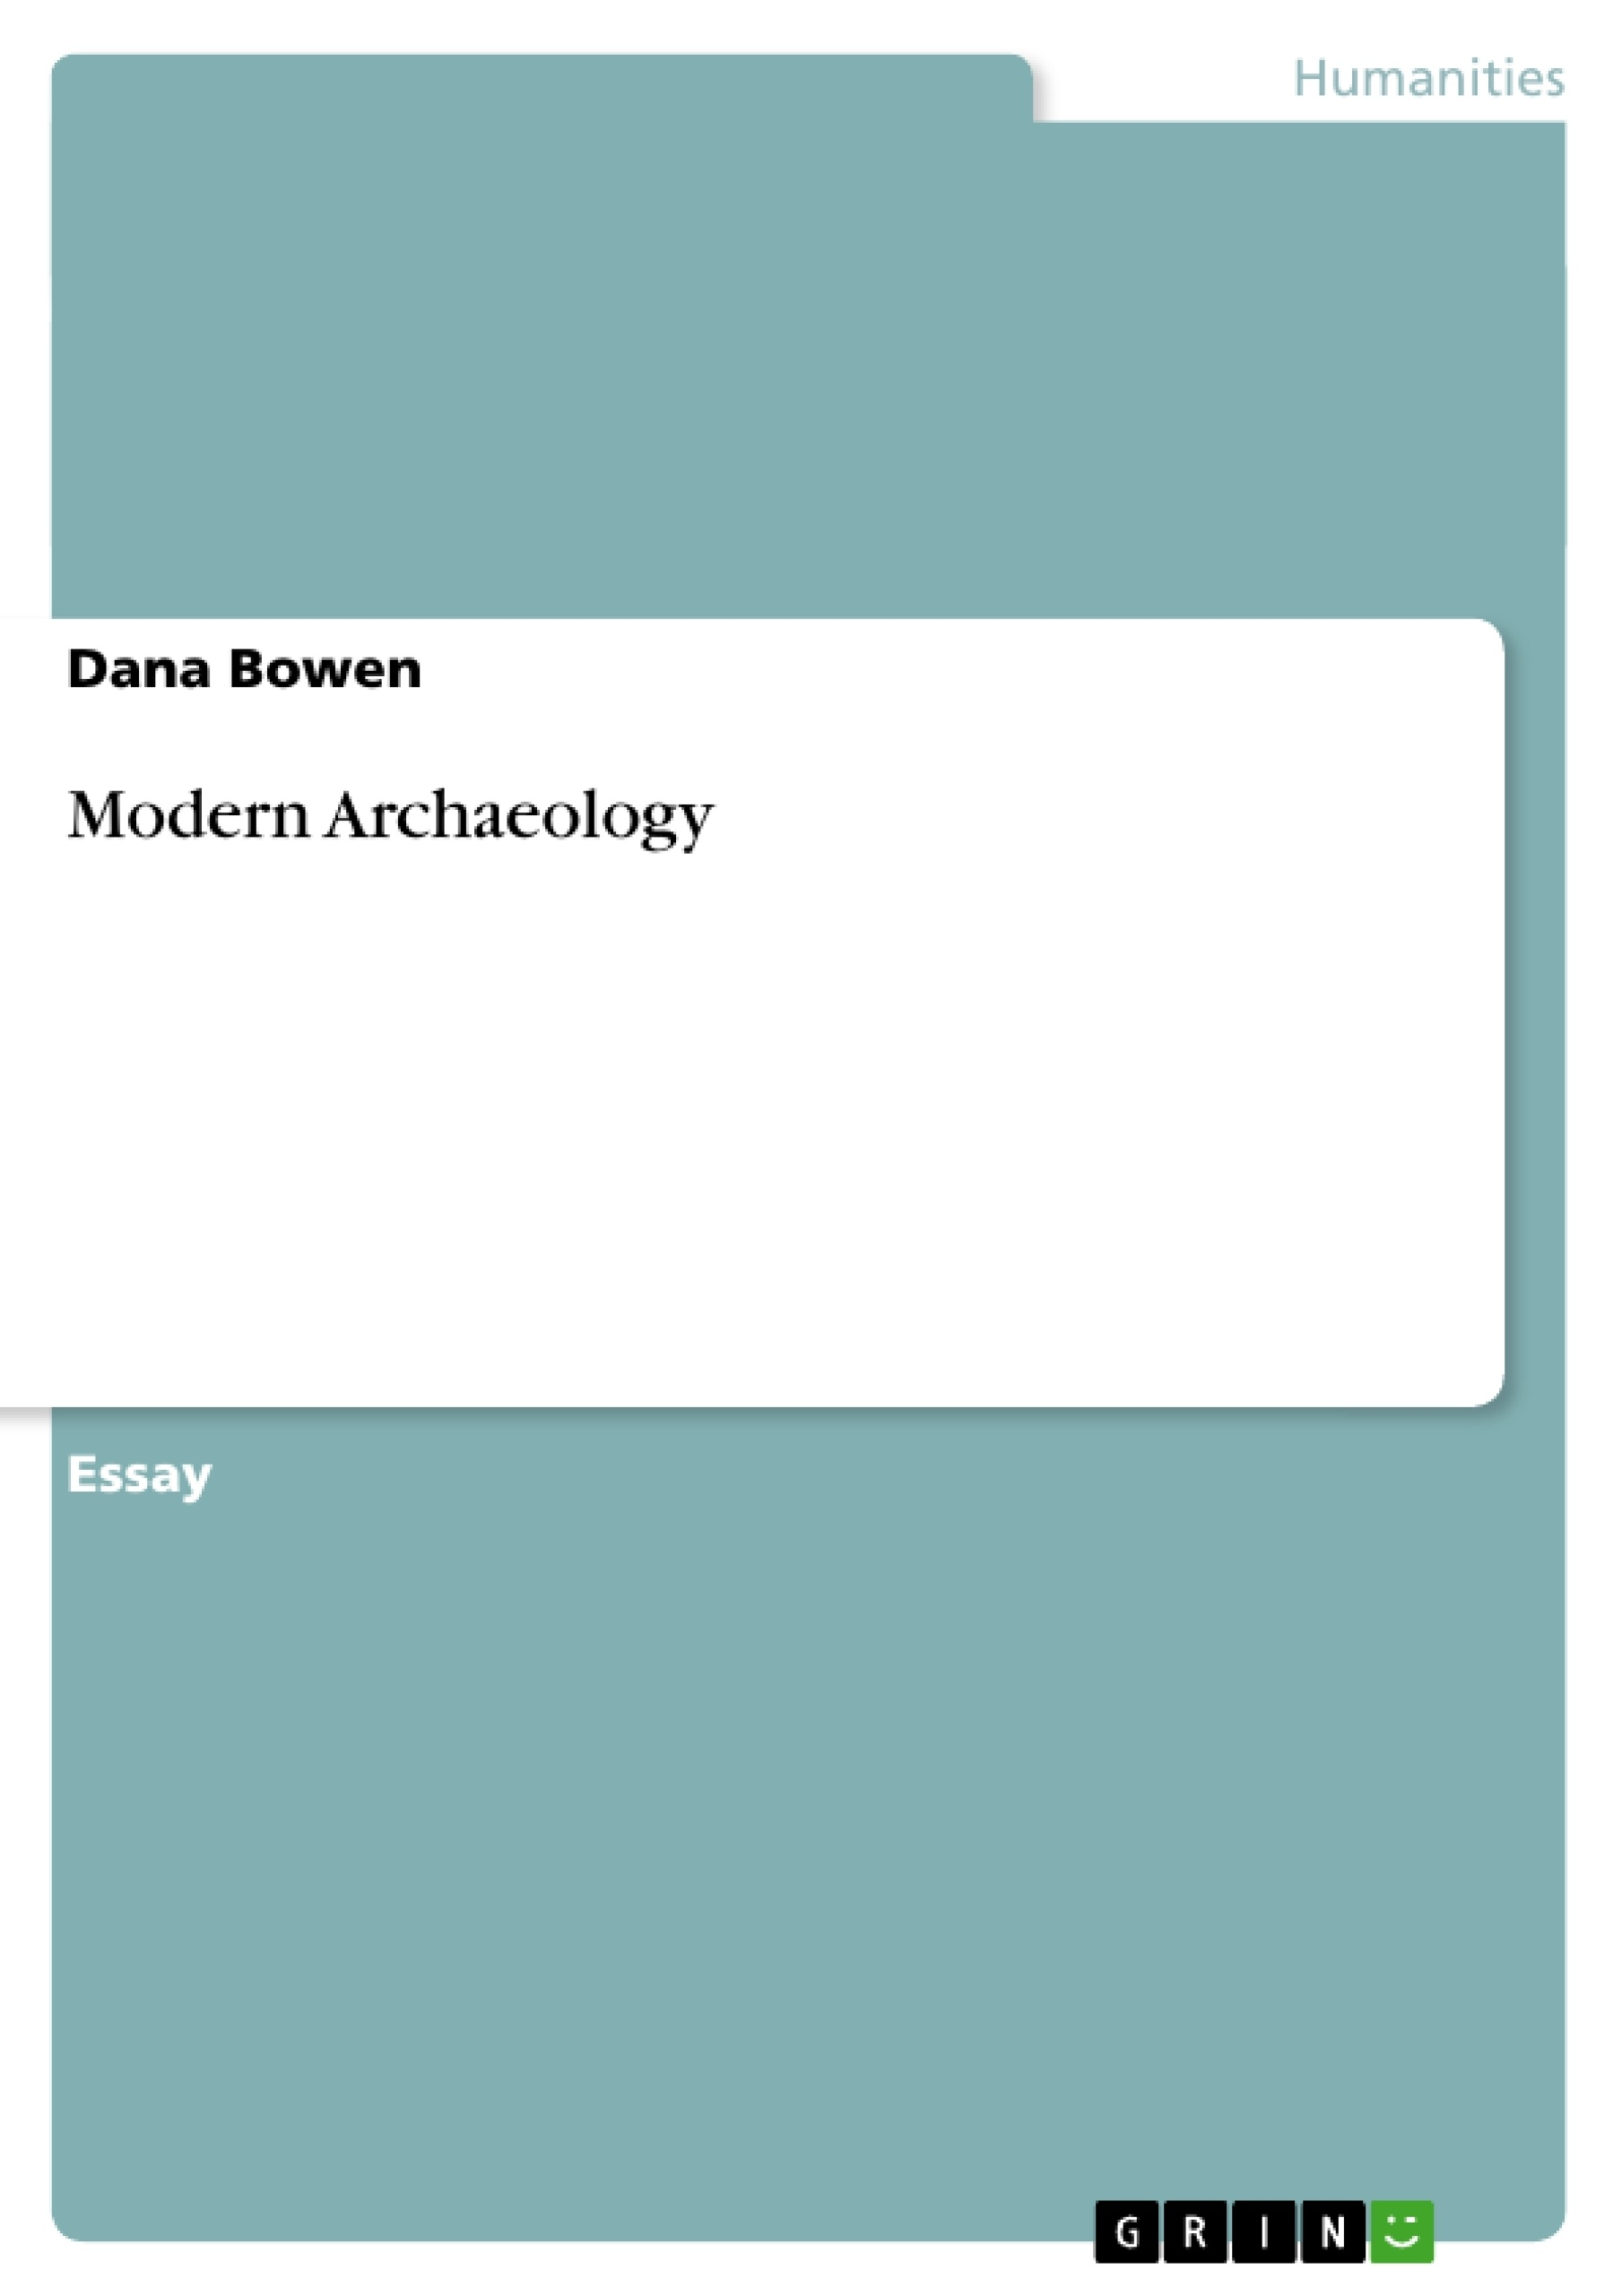 Title: Modern Archaeology